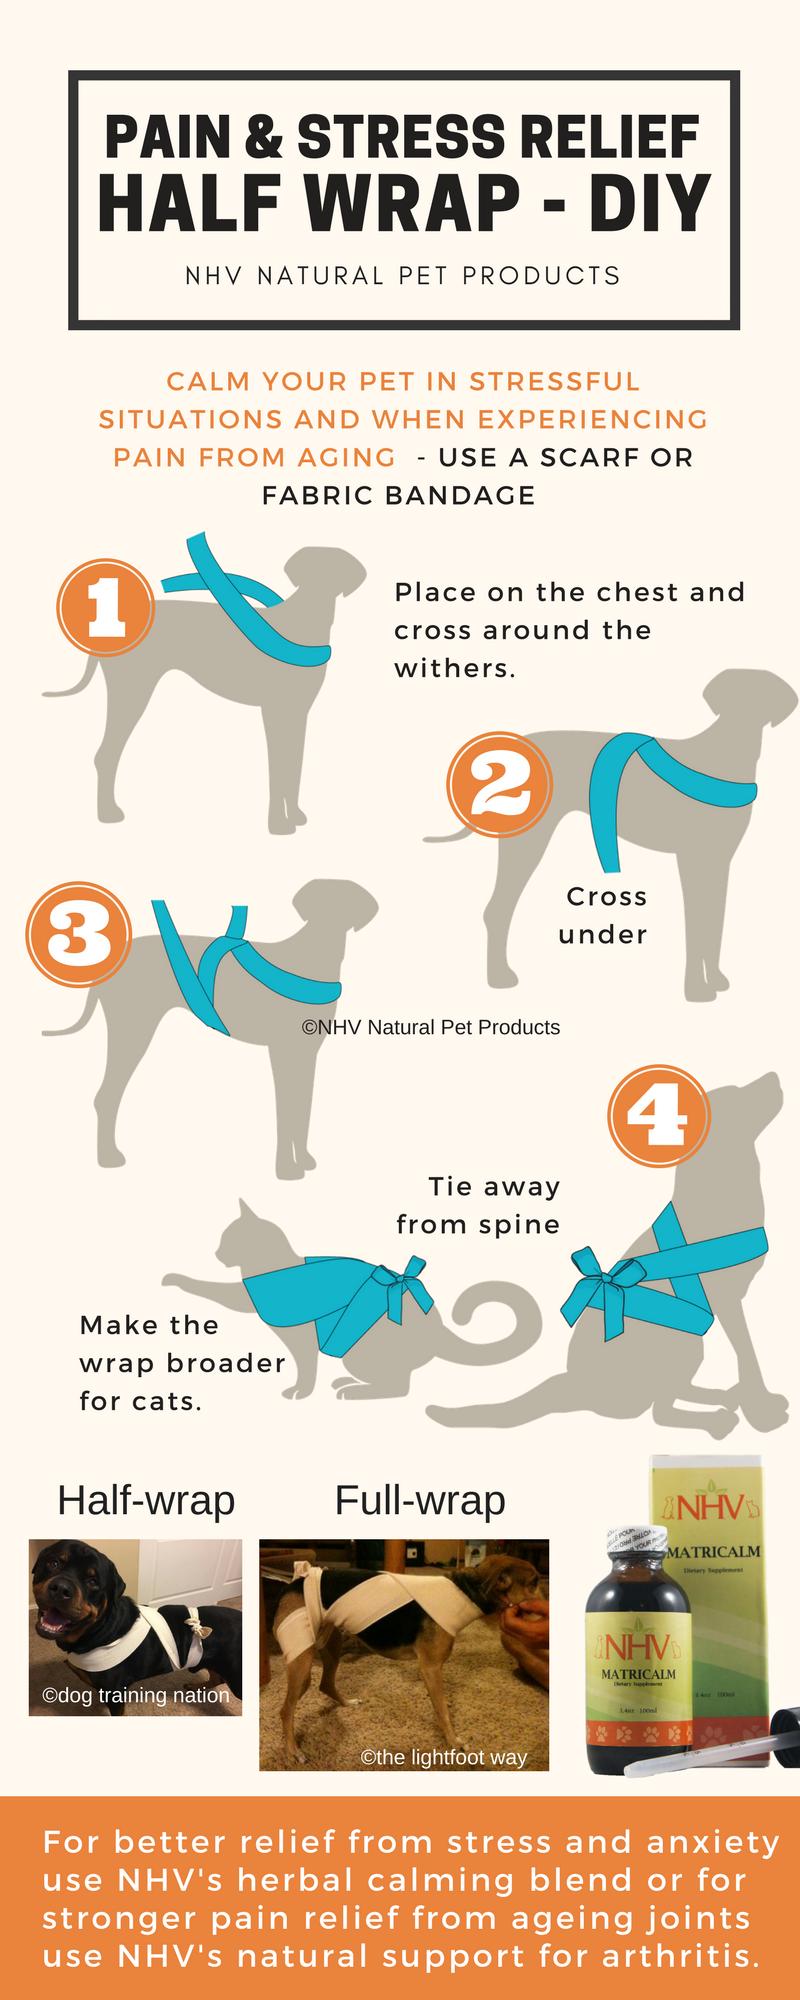 Pain & stress relief halfwrap DIY Calm your pet in